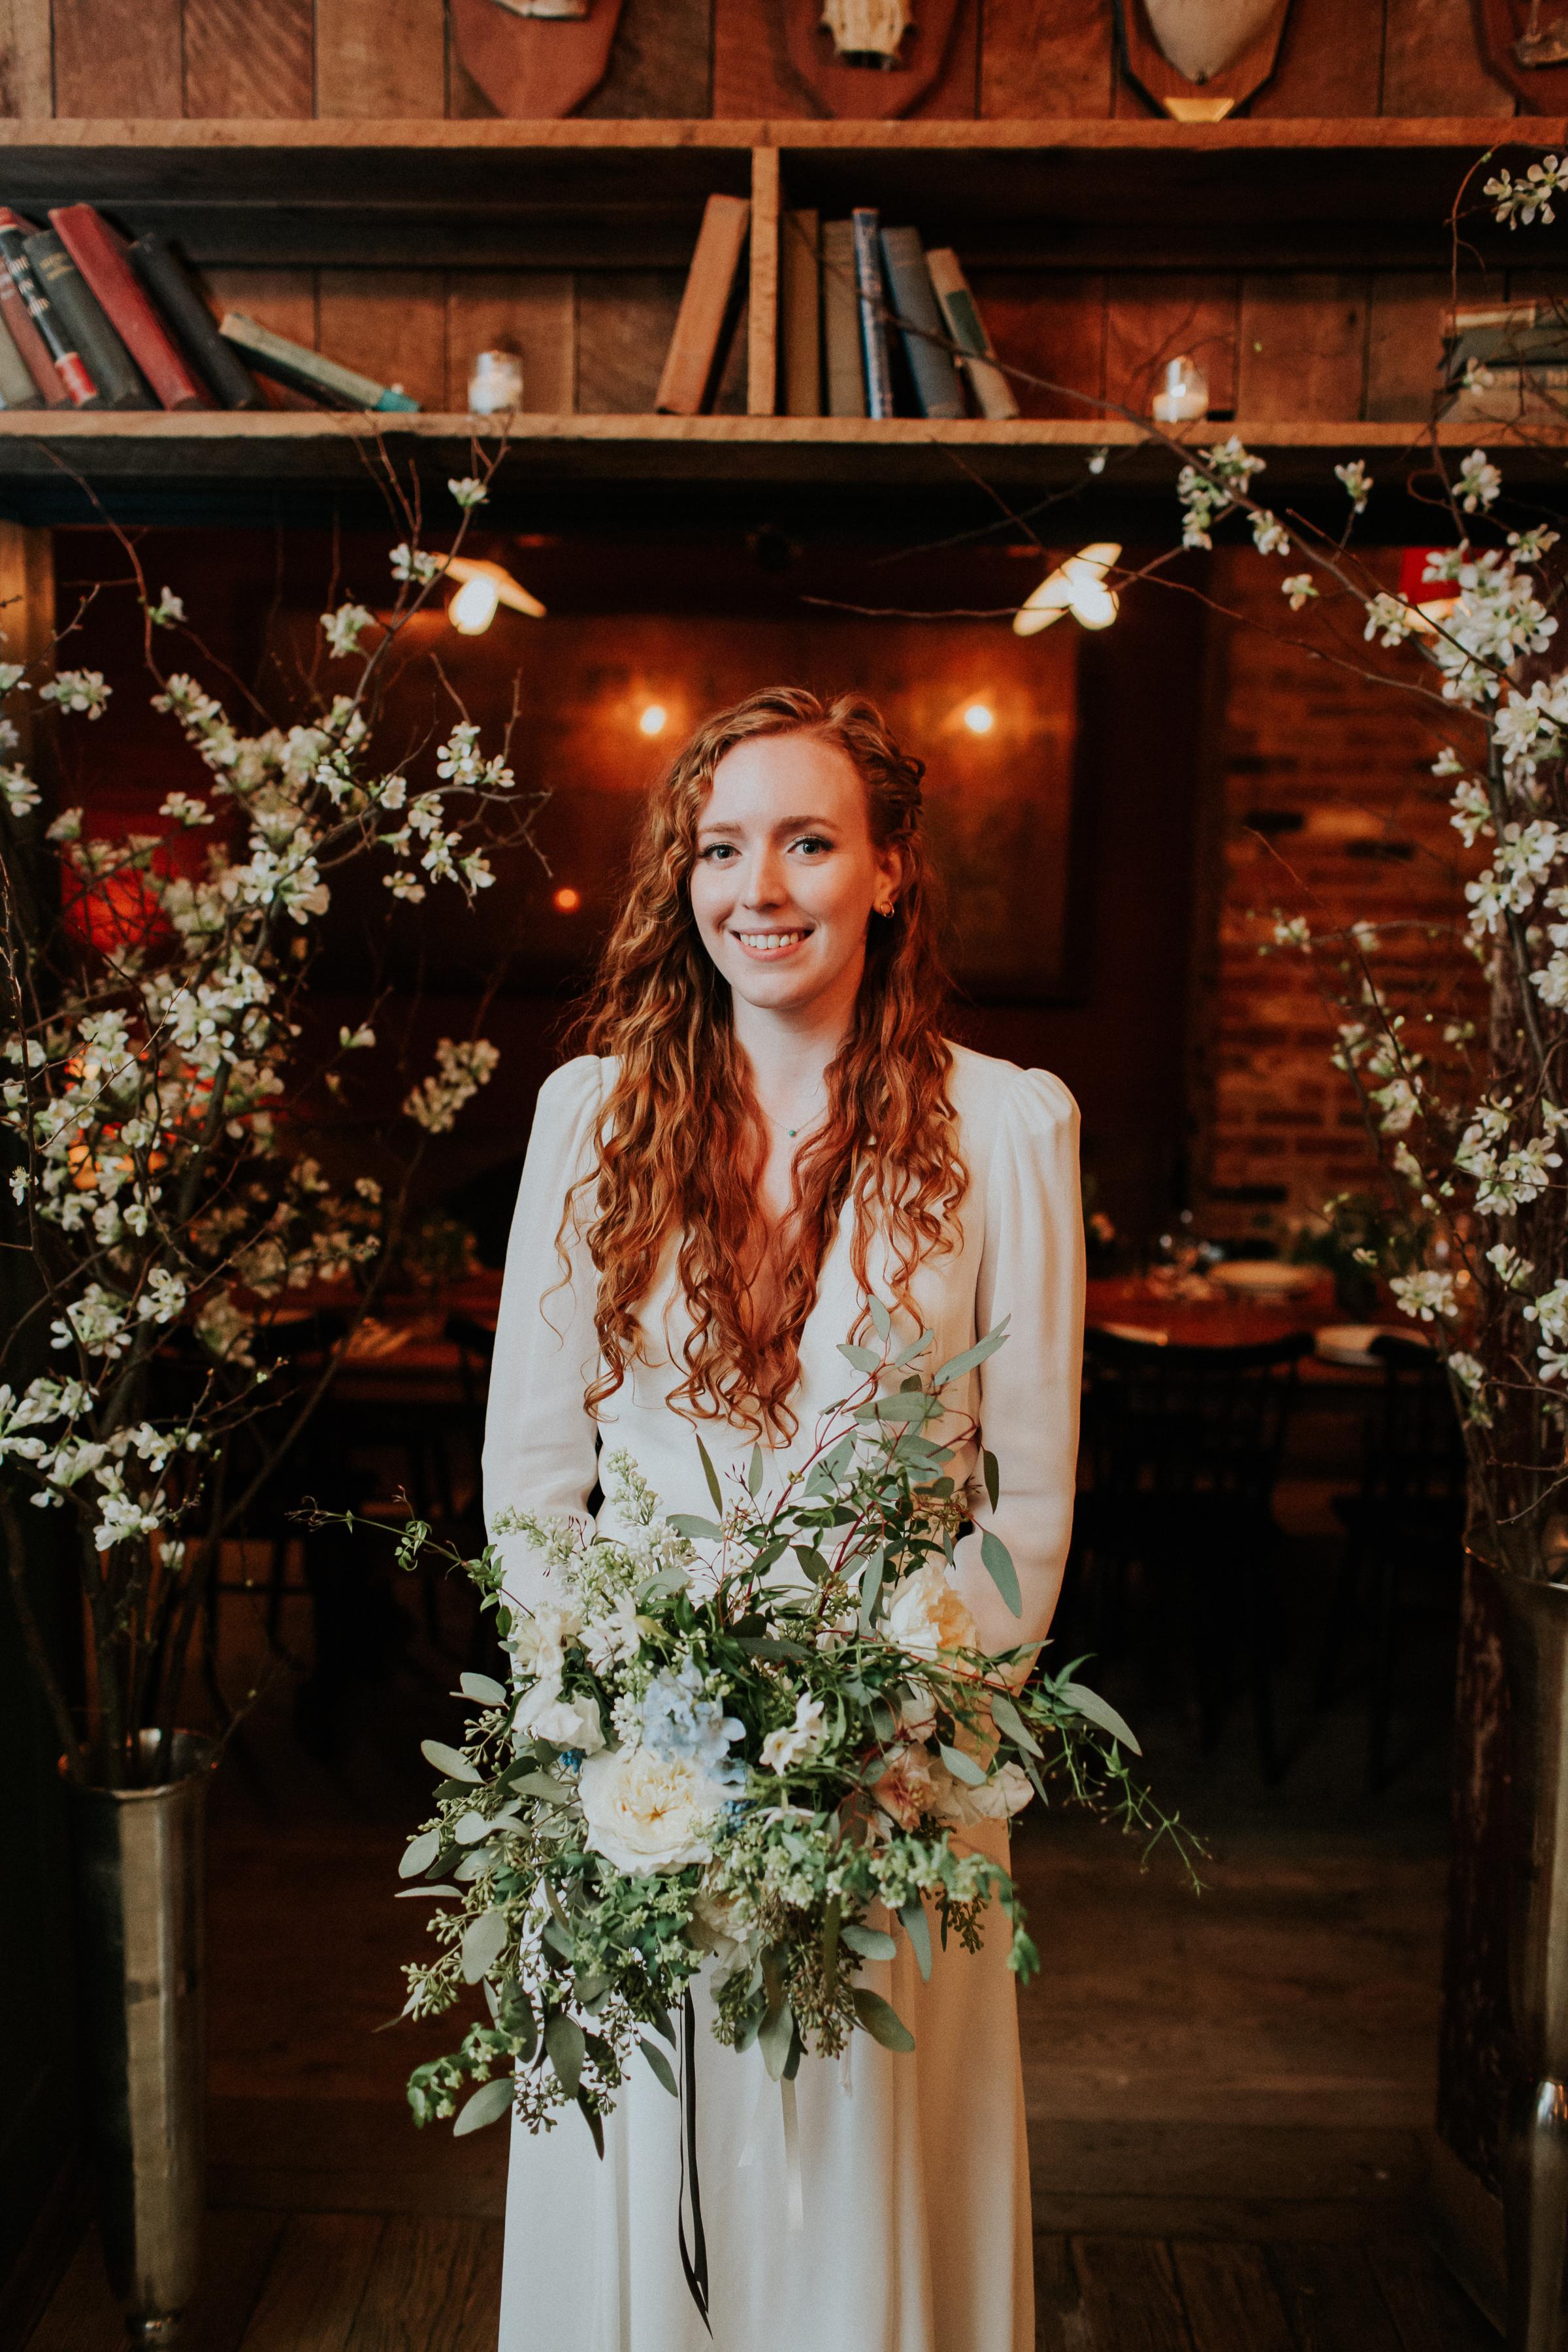 Freemans-Restaurant-Soho-Brooklyn-Bridge-Park-Dumbo-Documentary-Wedding-Photographer-41.jpg